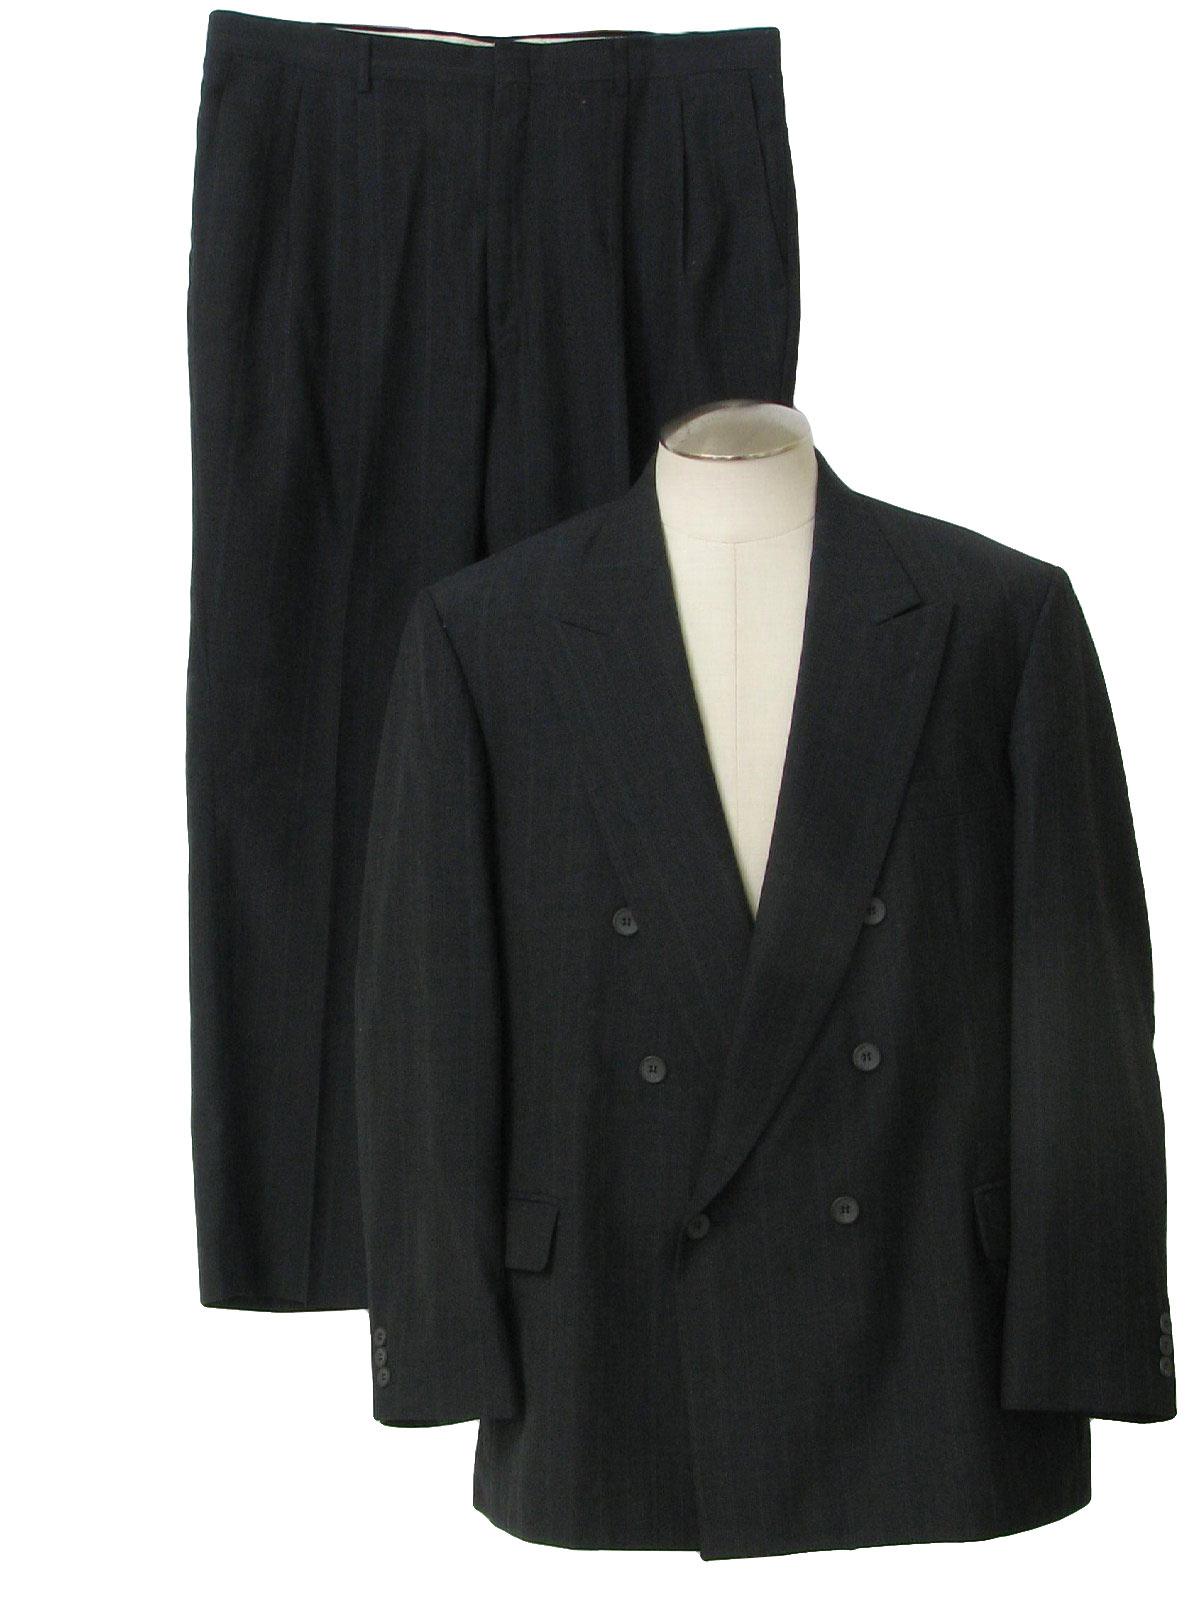 Retro 1980s Suit 80s Hagar Imperial Mens Charcoal Blue